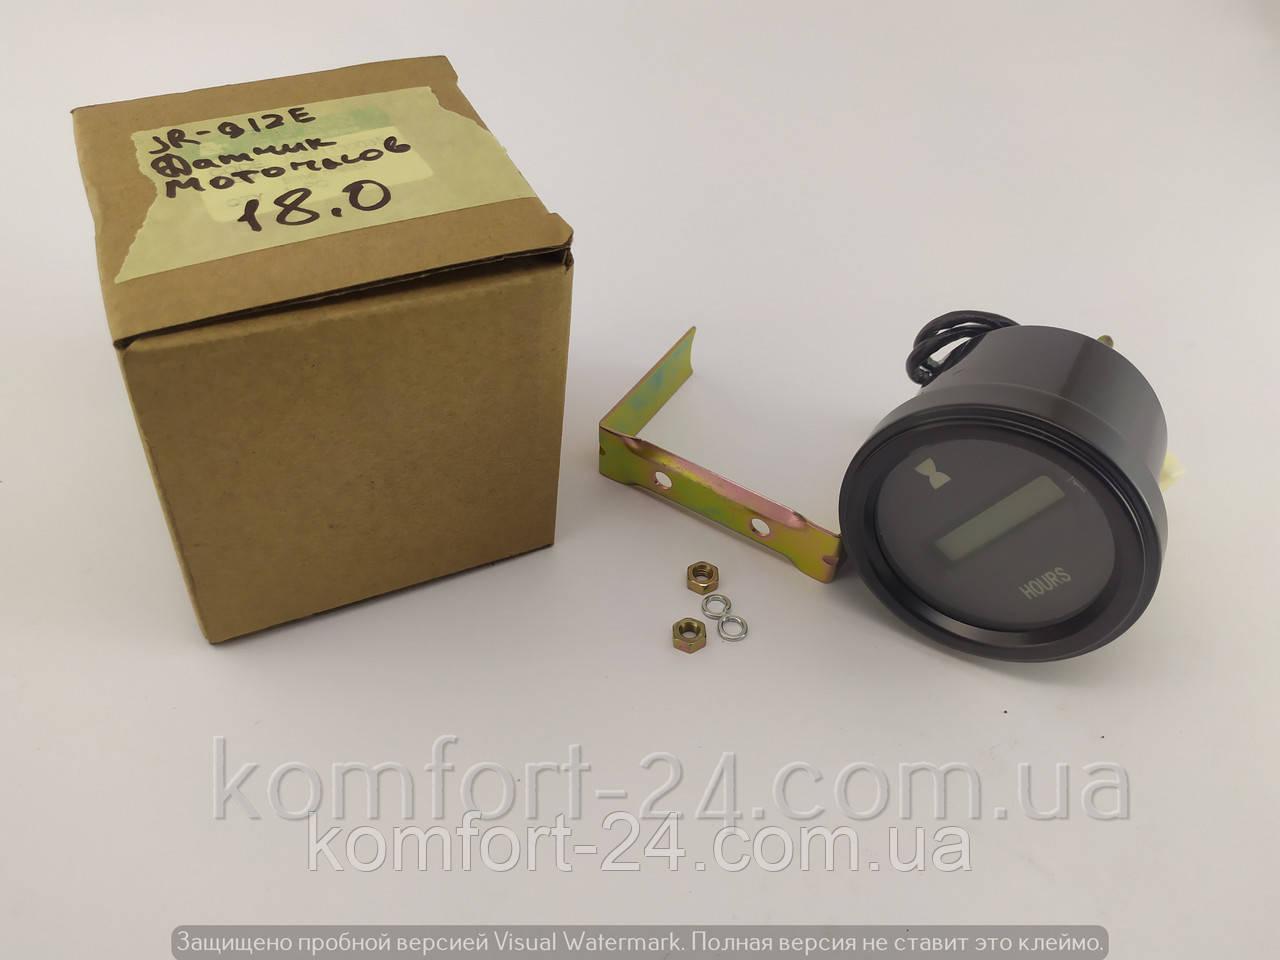 Датчик мотогодин електронний JR-Q12E Zubr